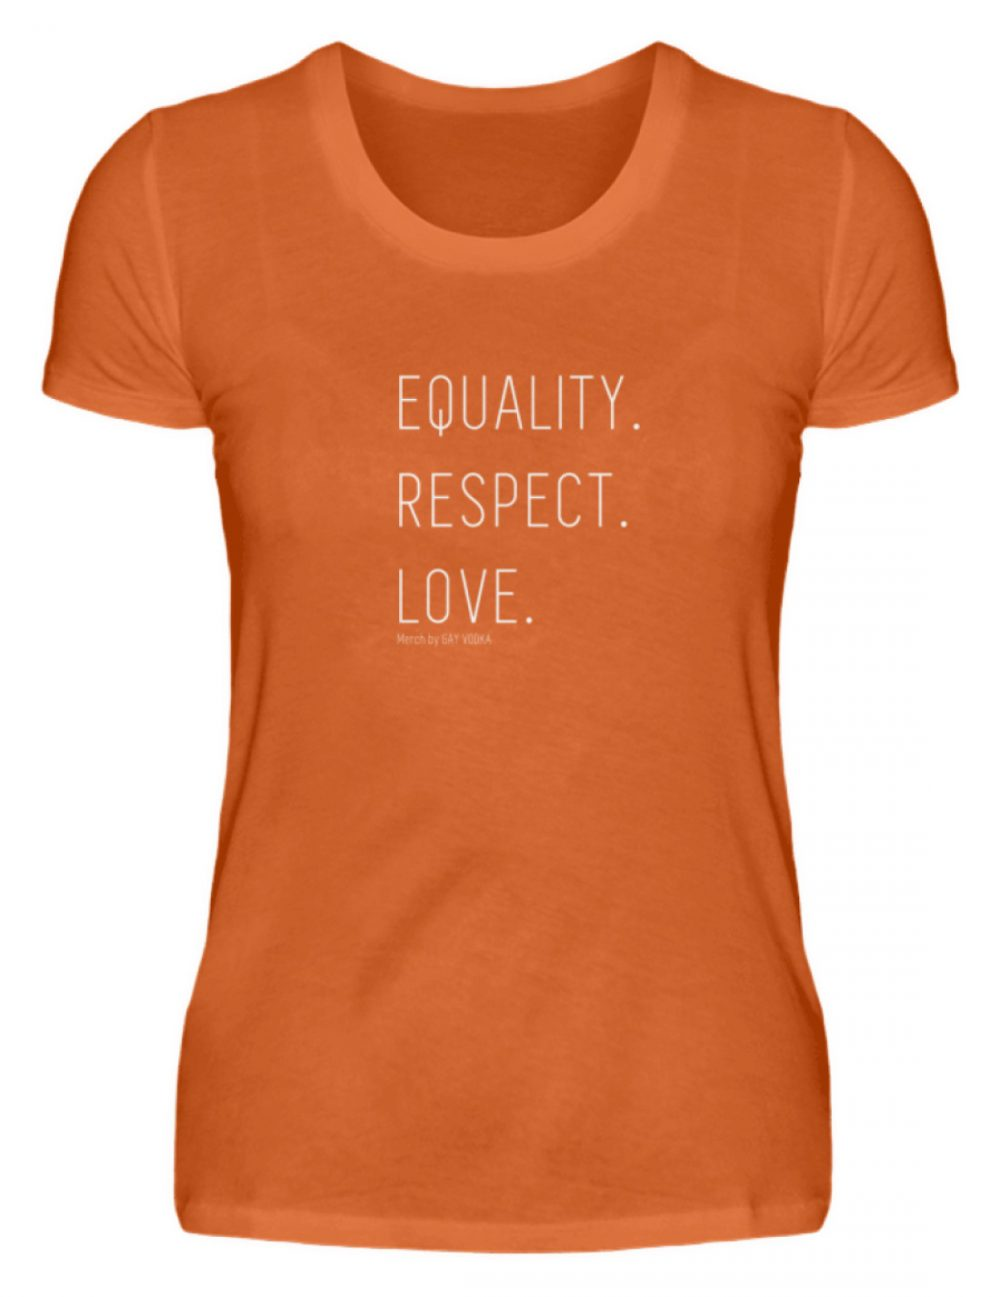 EQUALITY. RESPECT. LOVE. - Damen Premiumshirt-2953